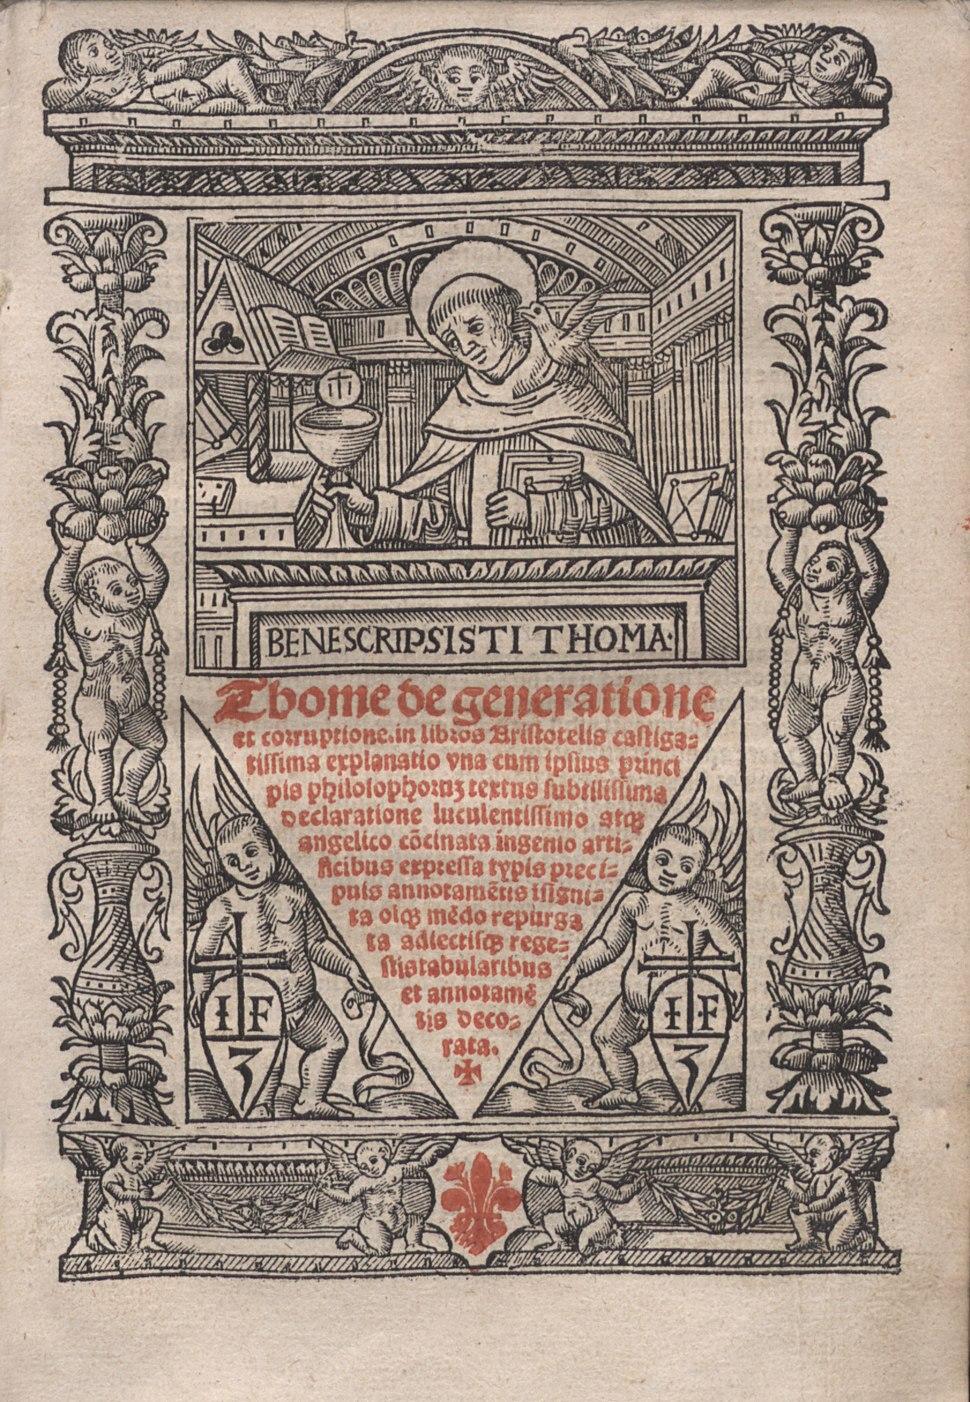 Tommaso - Super libros de generatione et corruptione - 4733257 00007